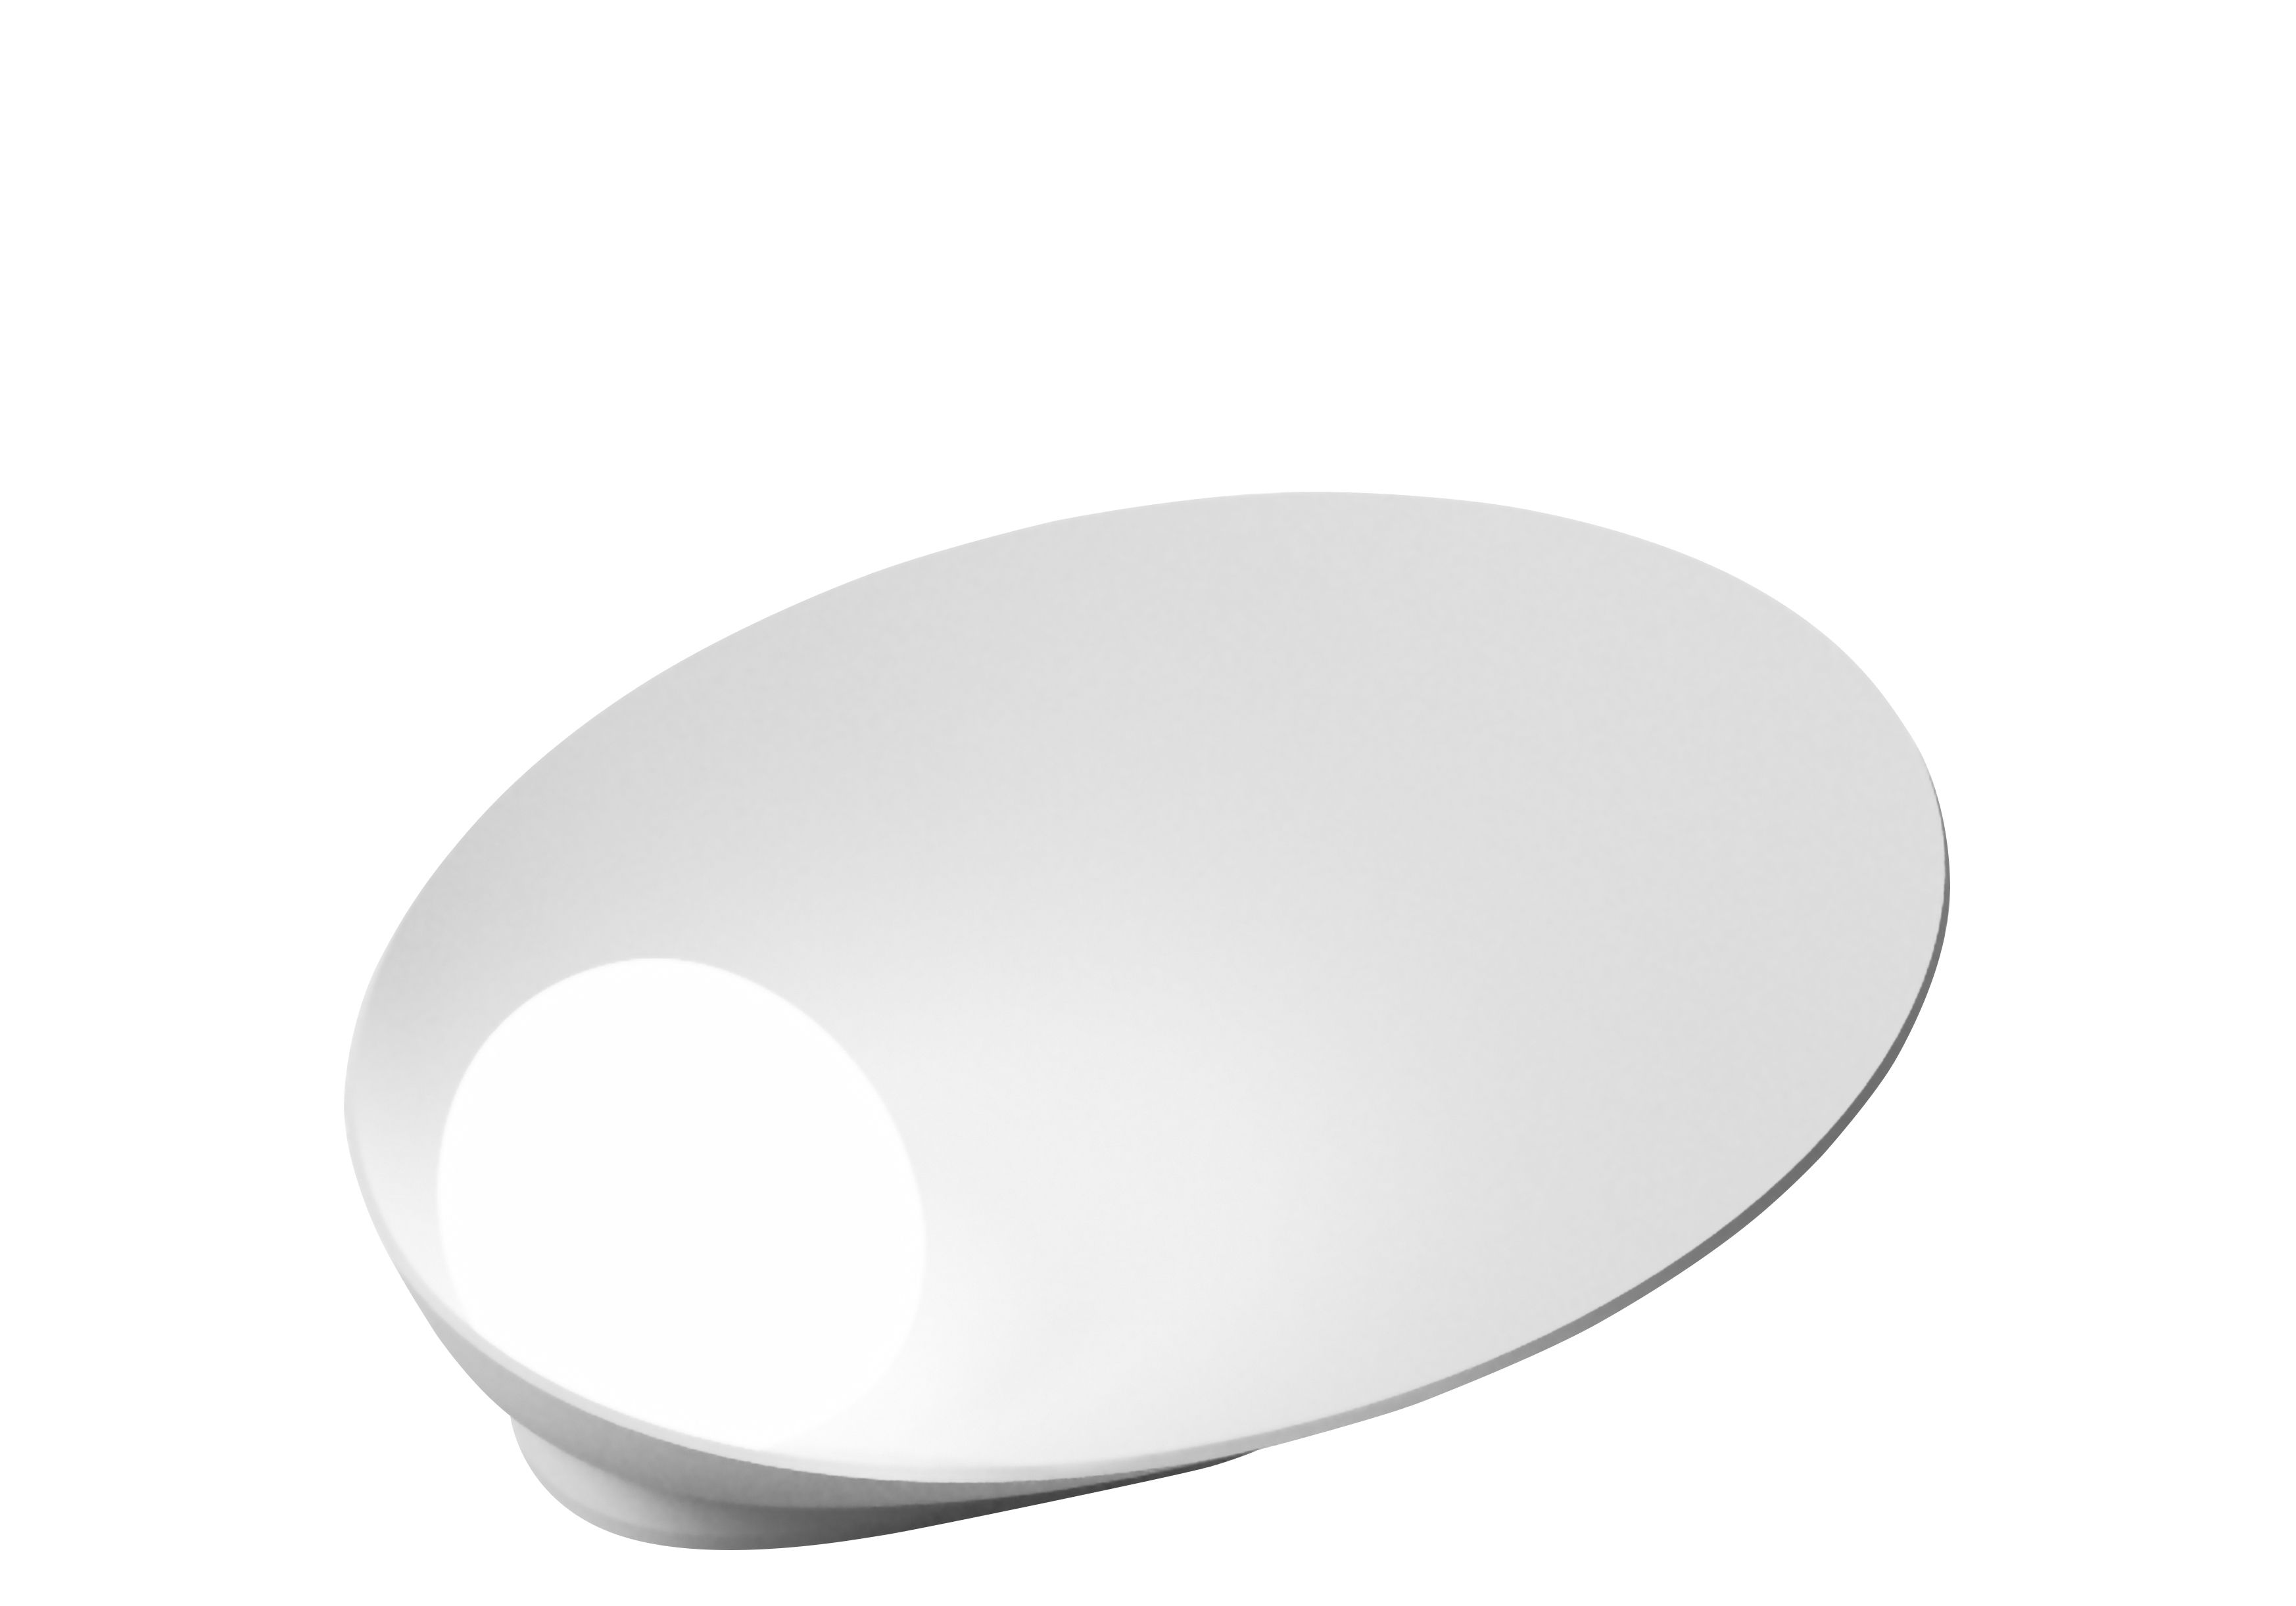 Lighting - Table Lamps - Musa Table lamp - / Version couchée - Ø 26 cm by Vibia - Laqué blanc mat - Aluminium, Opalin mouth blown glass